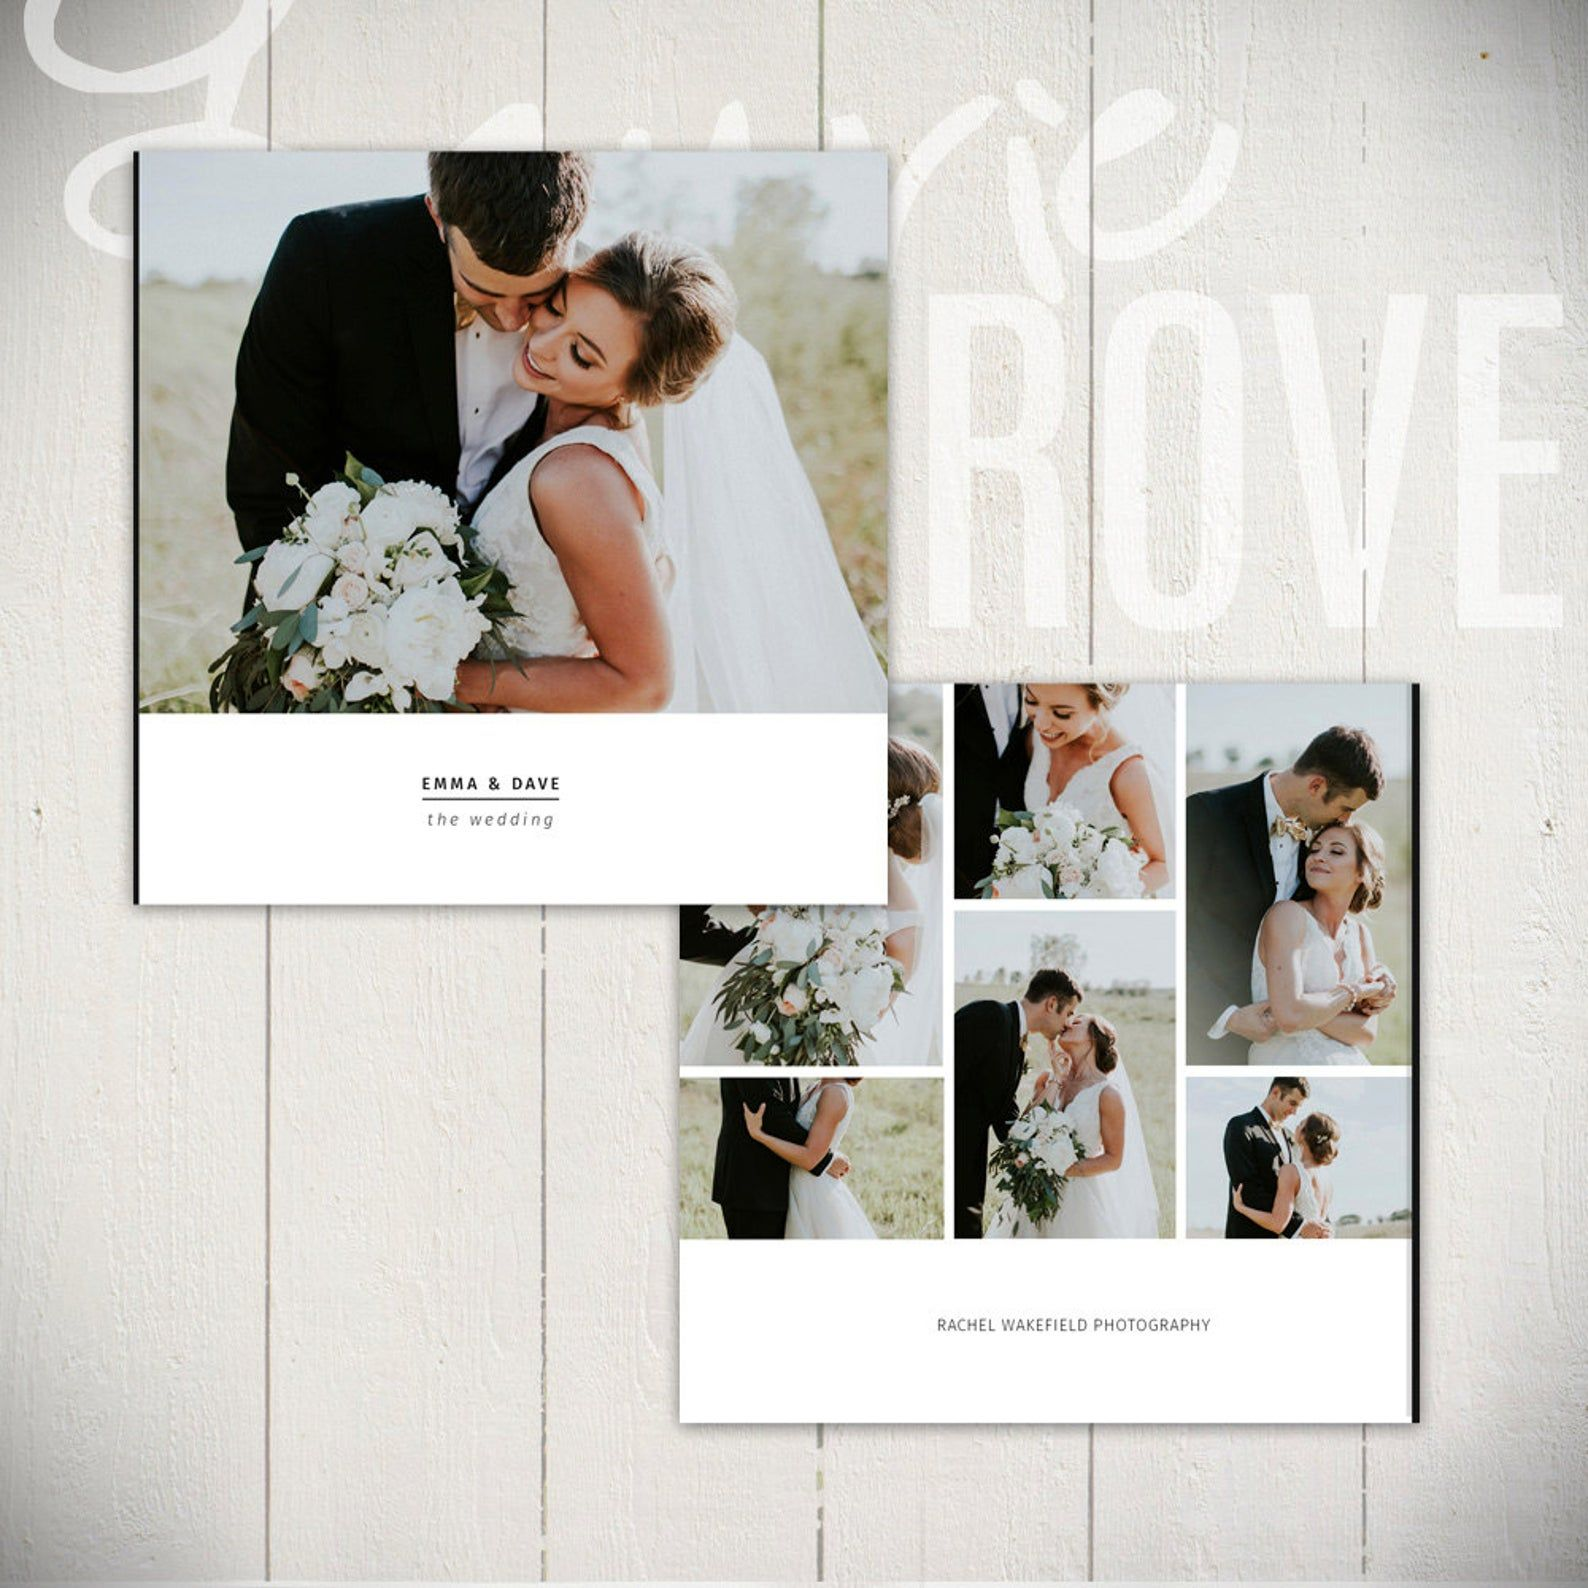 Wedding Album Template Black Tie 10x10 Wedding Book Etsy In 2020 Album Photography Wedding Album Templates Wedding Book